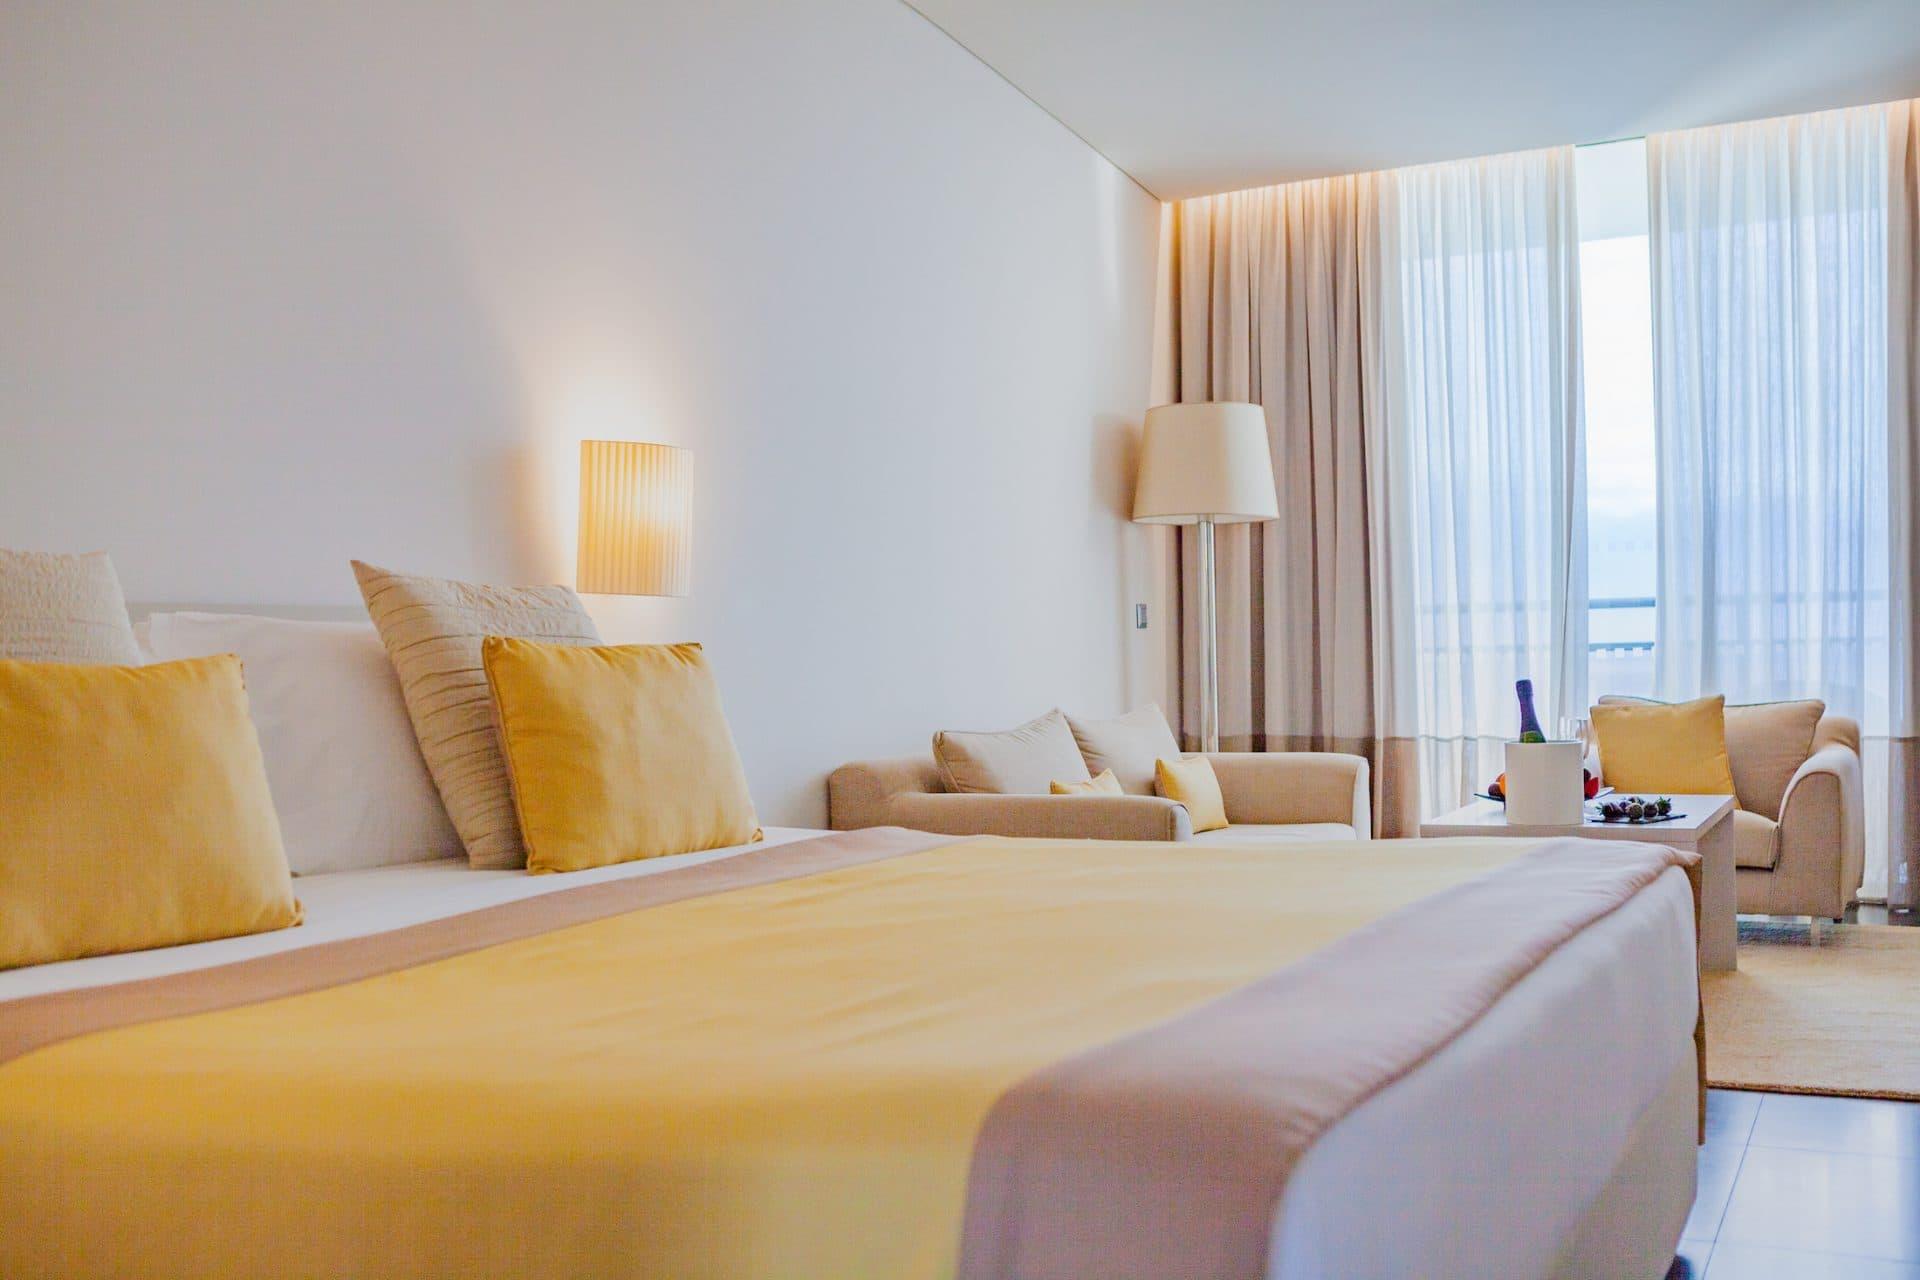 accommodation-premium-rooms-VidaMar-hotels-resorts